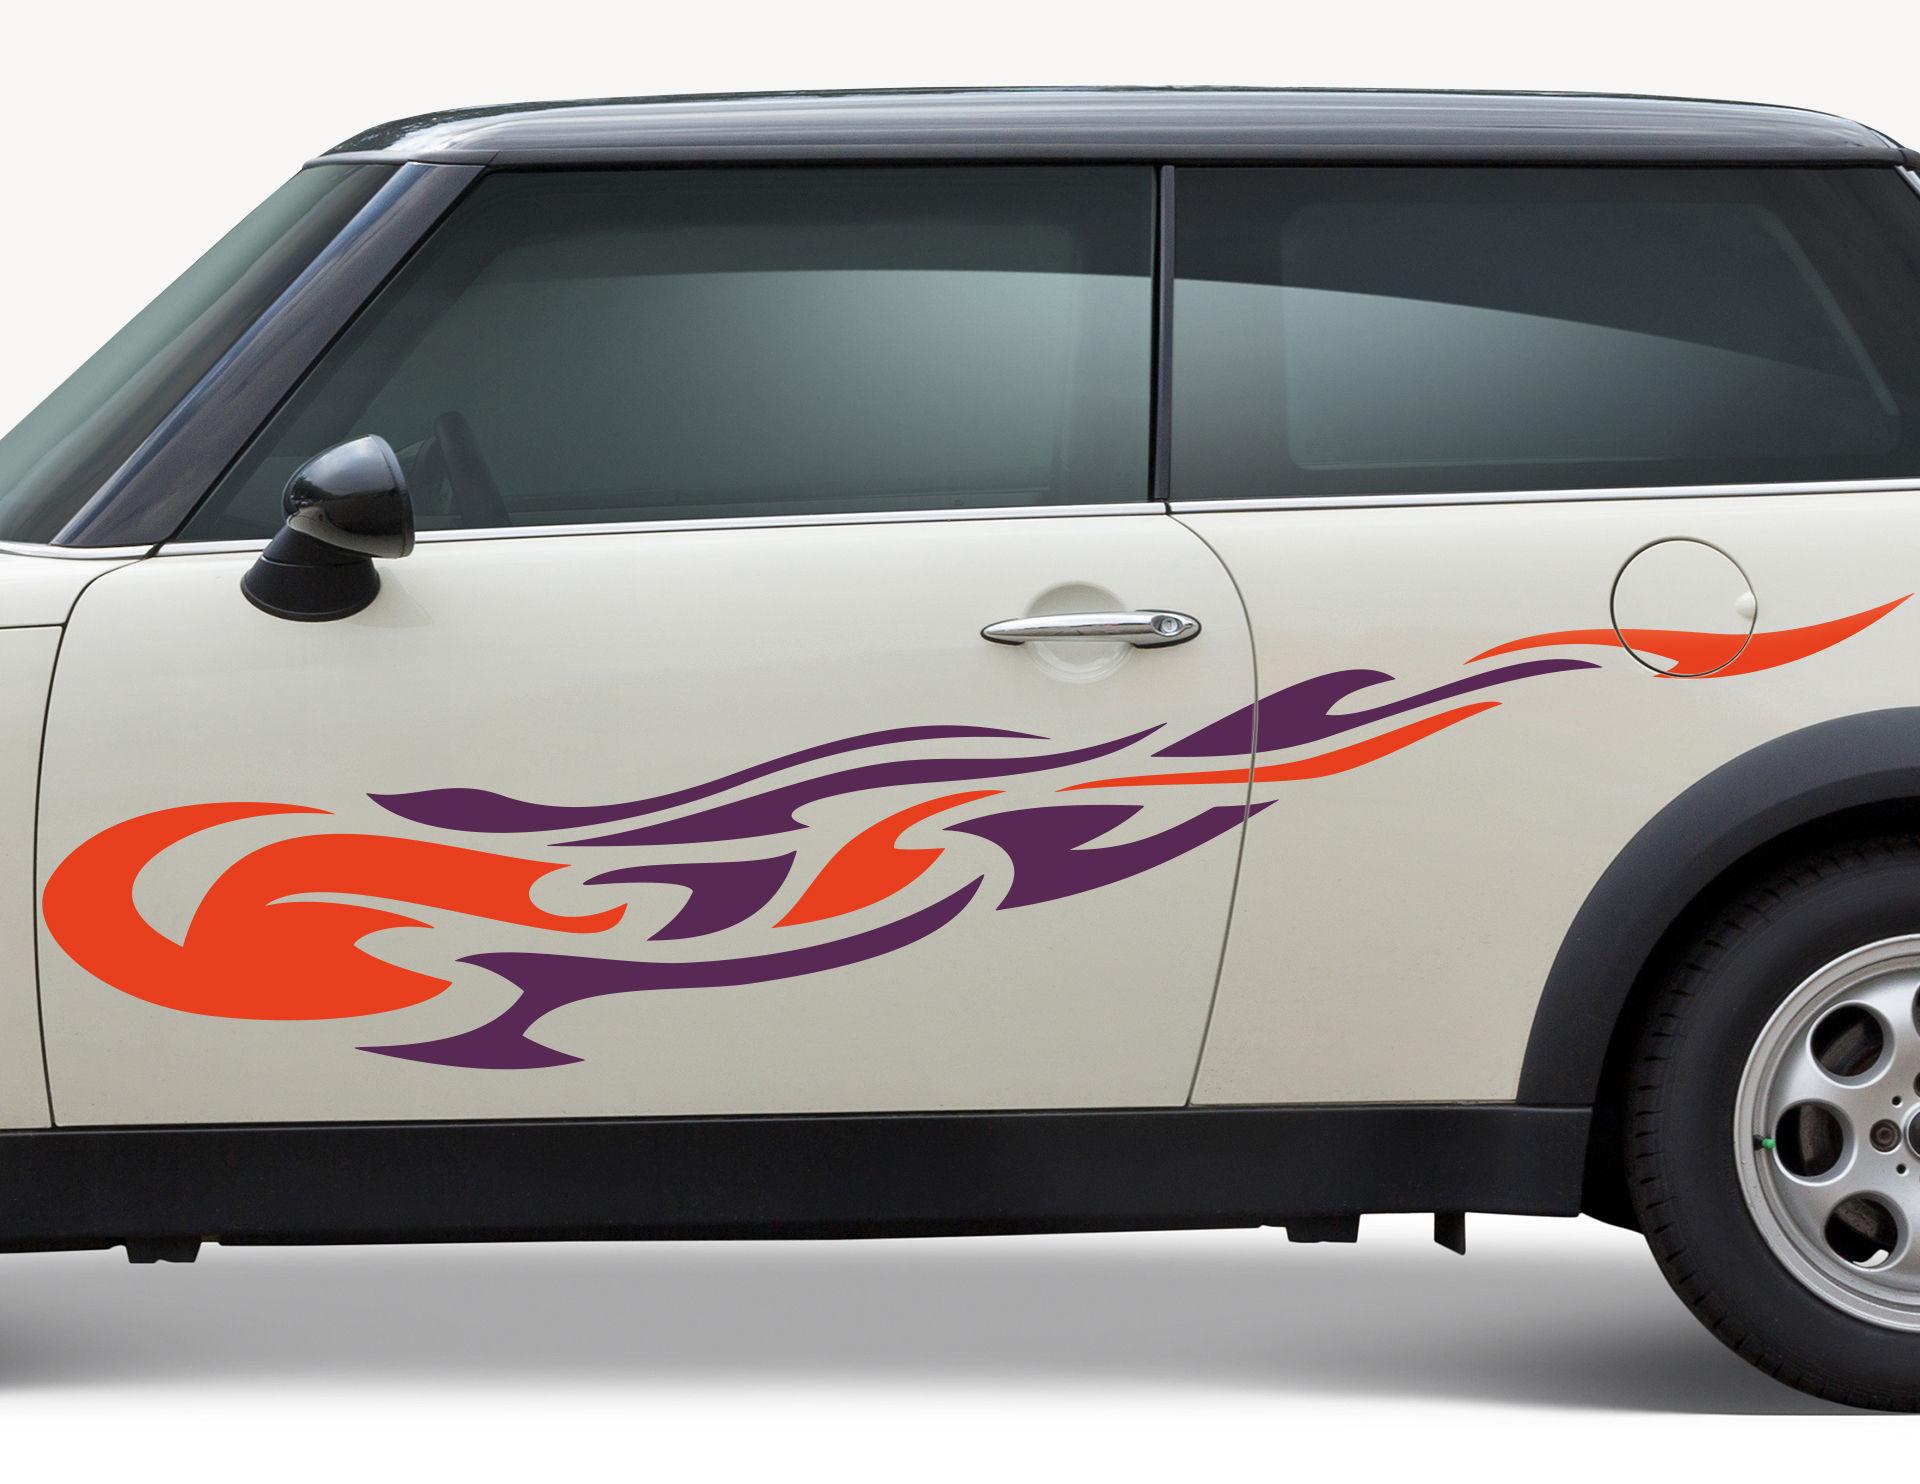 Autoaufkleber Hot-Fame-Flame-Set